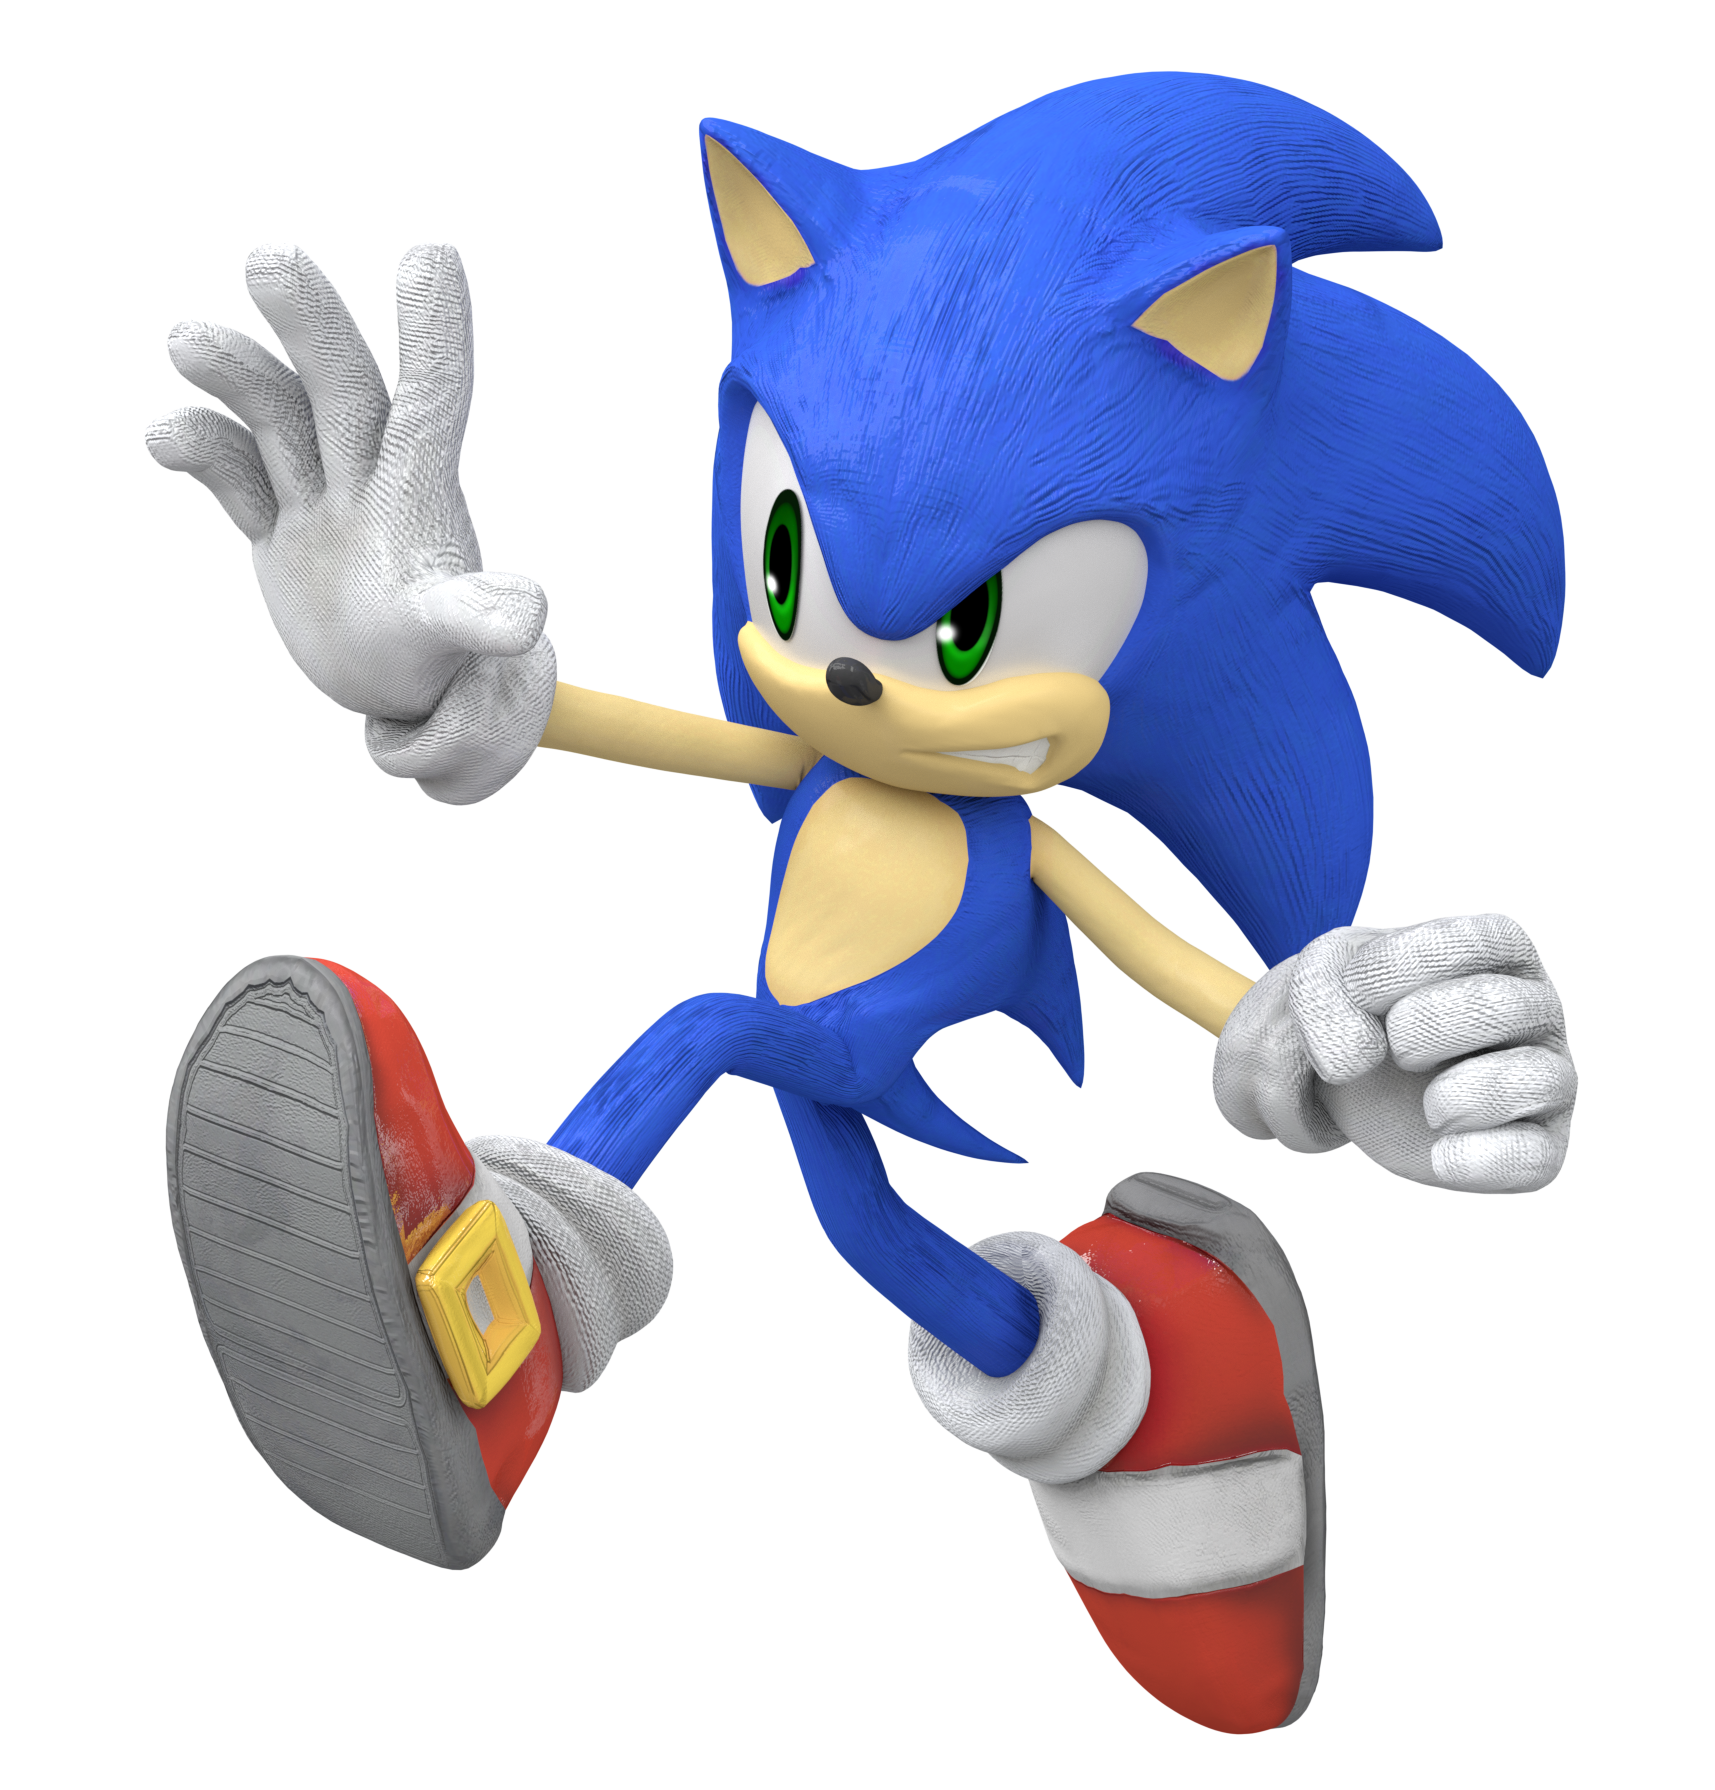 Sonic Super Smash Bros Ultimate Fan Render By Nintega Dario On Deviantart In 2021 Sonic Smash Bros Super Smash Bros